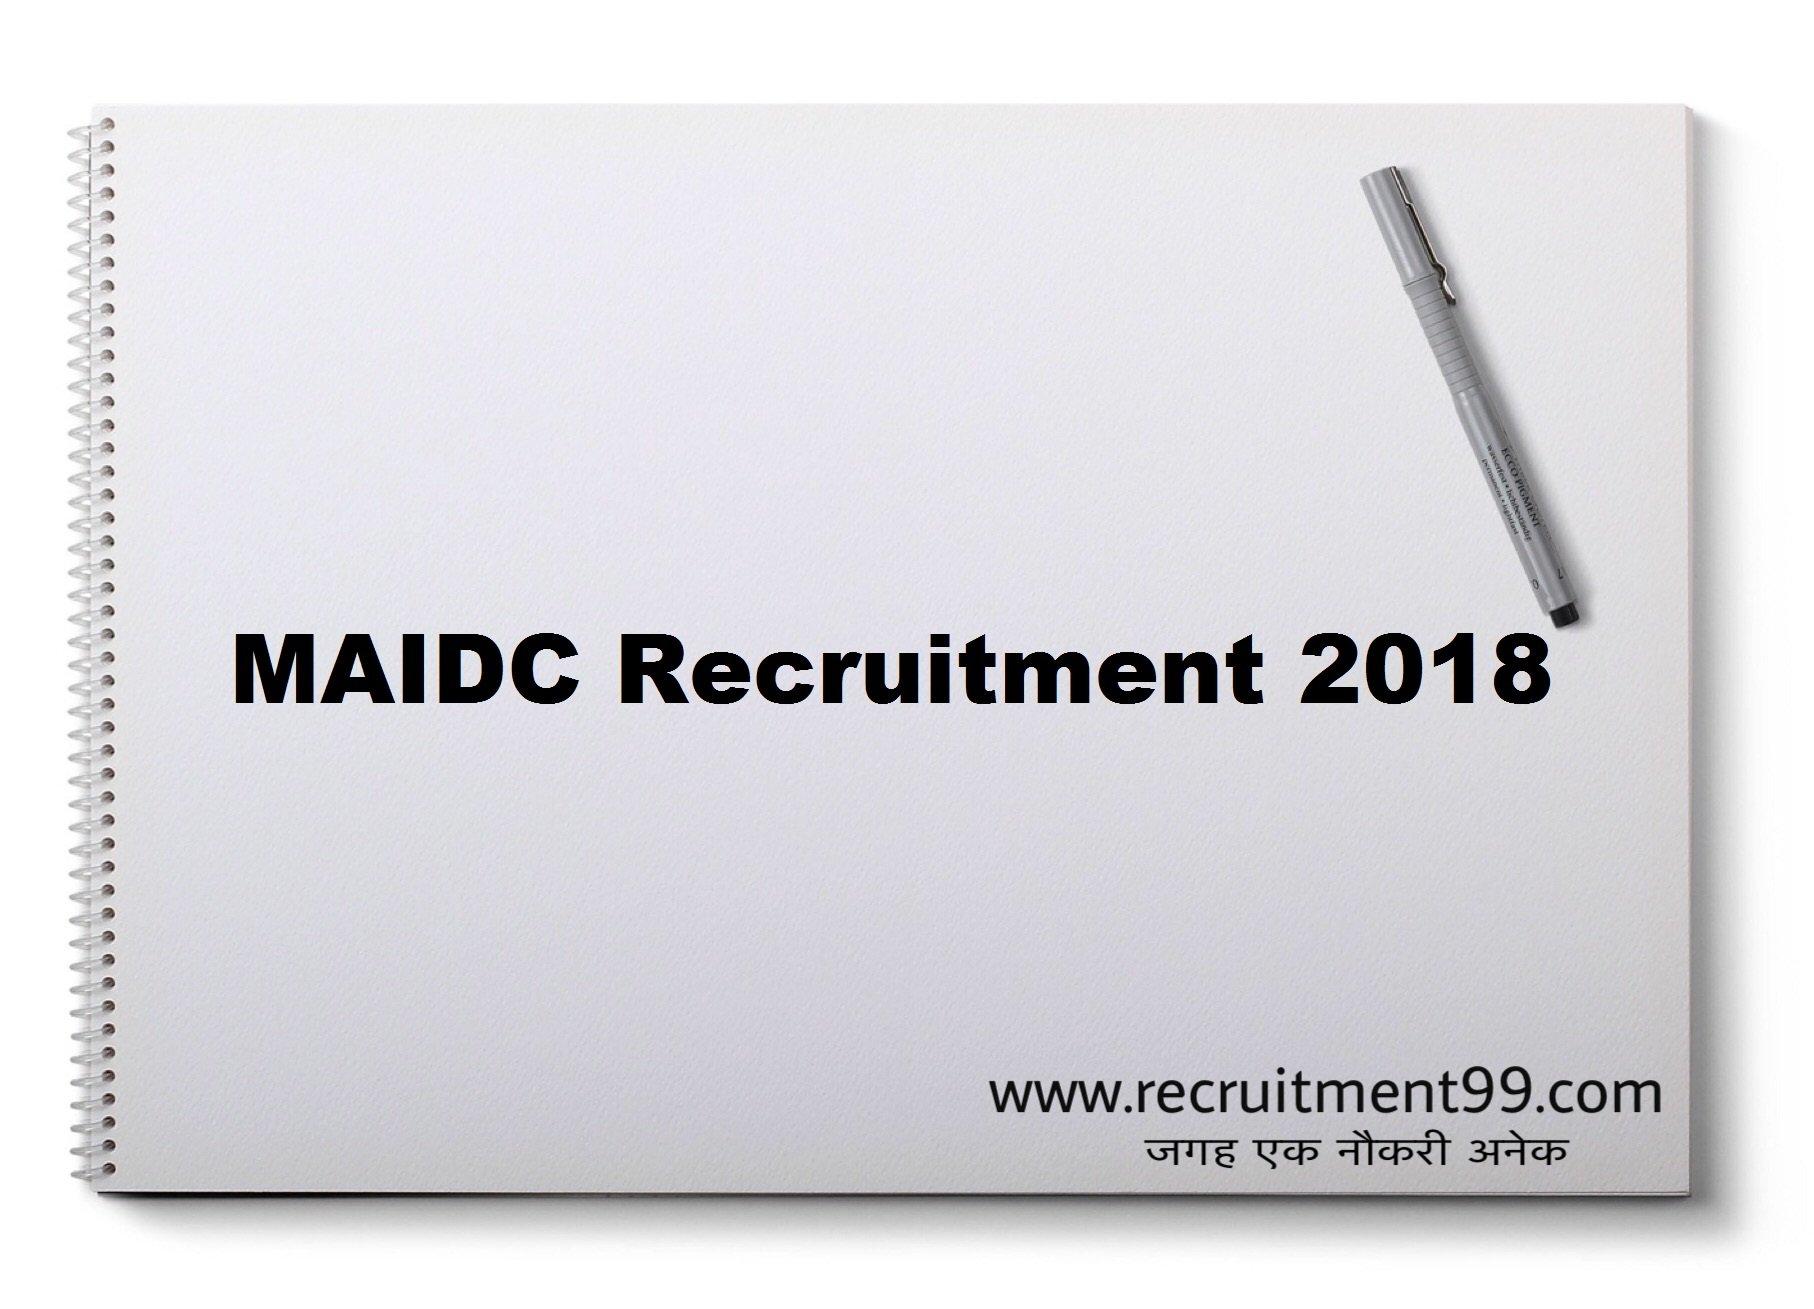 MAIDC Sales Representative Chemist Assistant Manager Recruitment Admit Card Result 2018